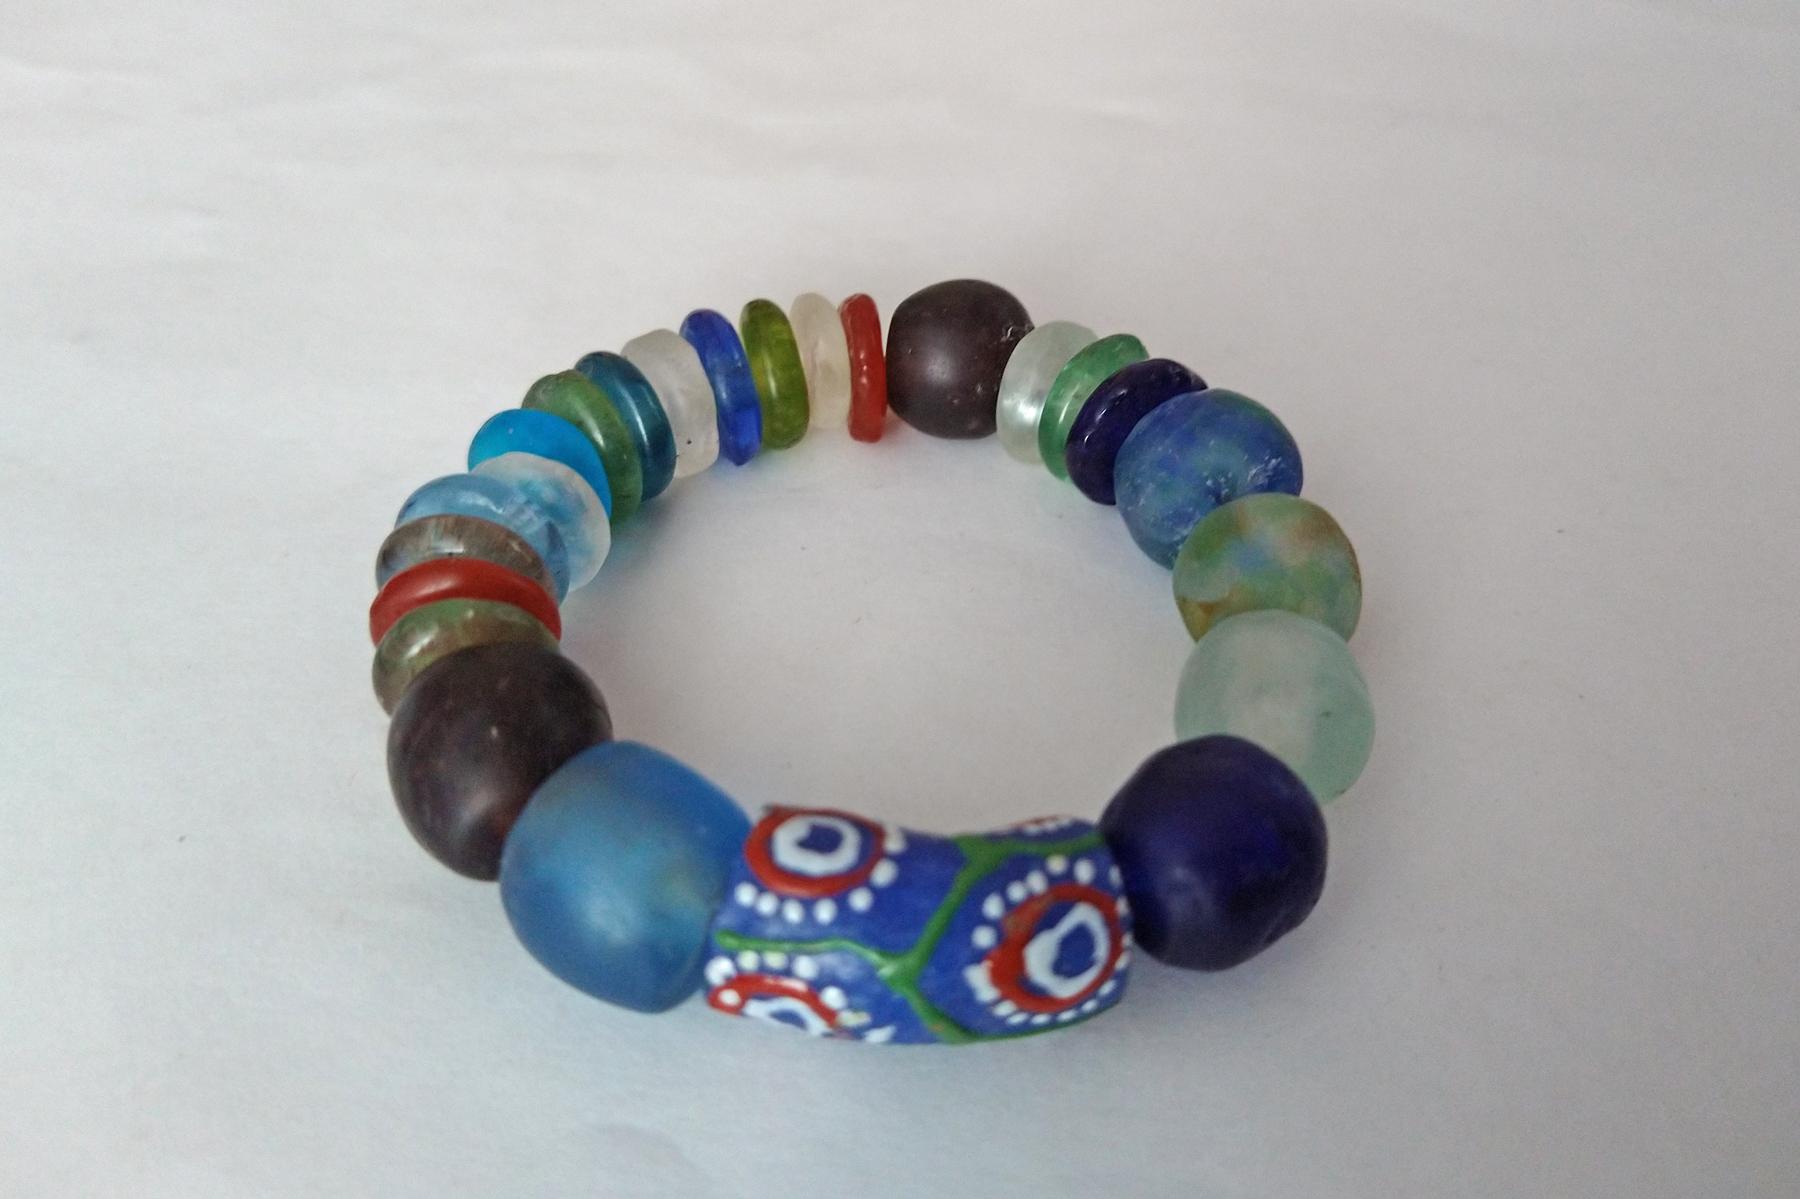 Chunky-recycled-glass-Krobo-Ghana-bracelet-with-focal-tube-bead